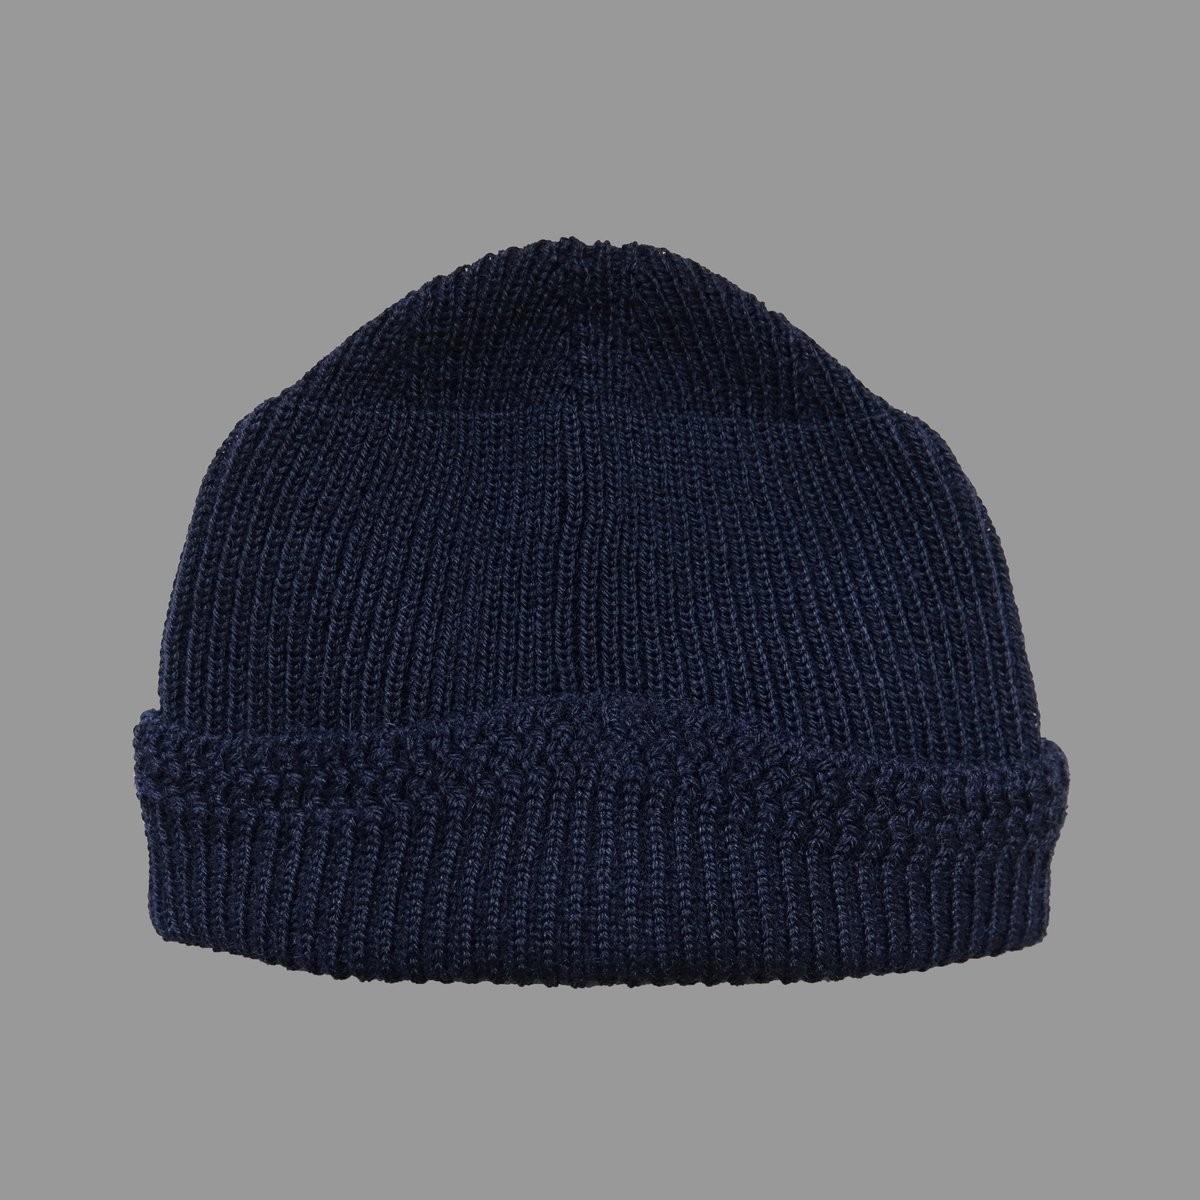 NSC DECK HAT : NAVY